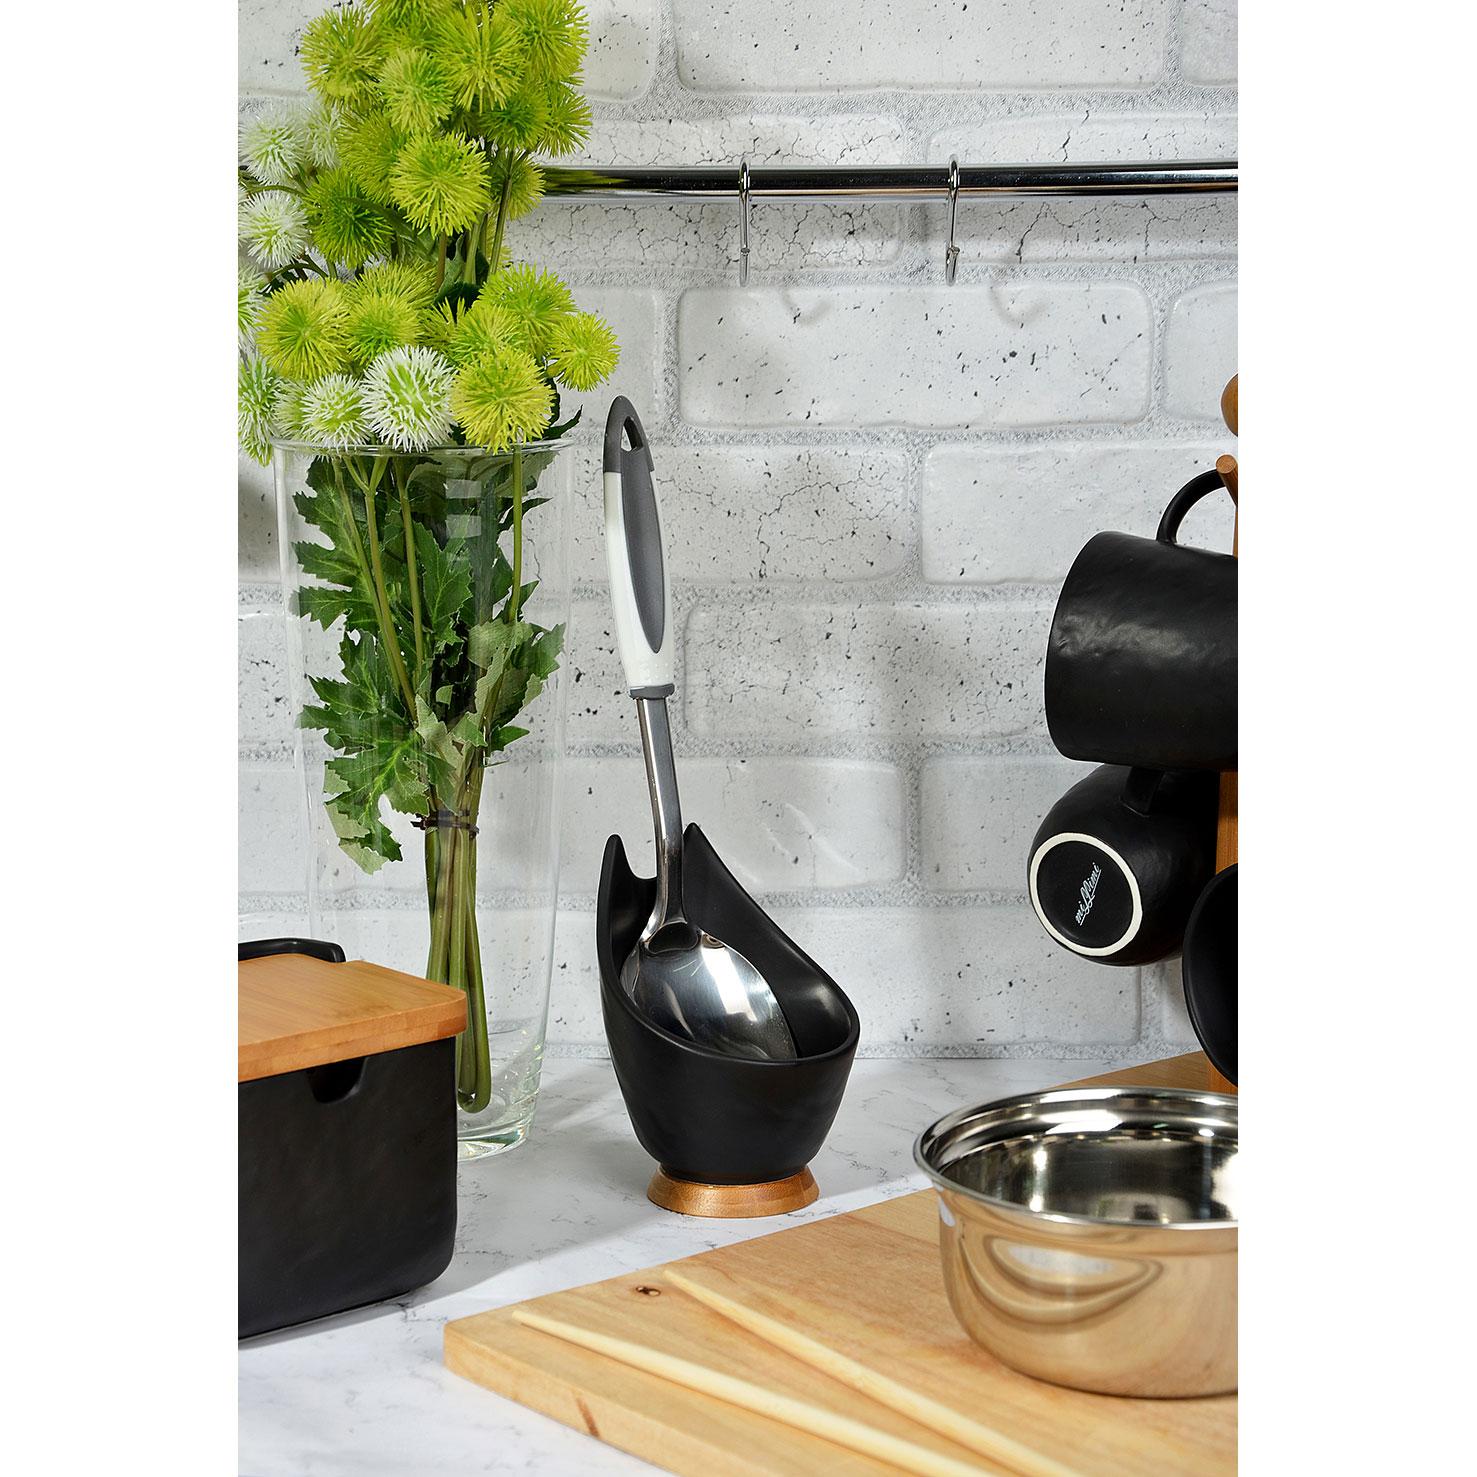 "Подставка под ложку 9,5х10х13,5 см, матовая керамика/бамбук, MILLIMI ""Черный бархат"""